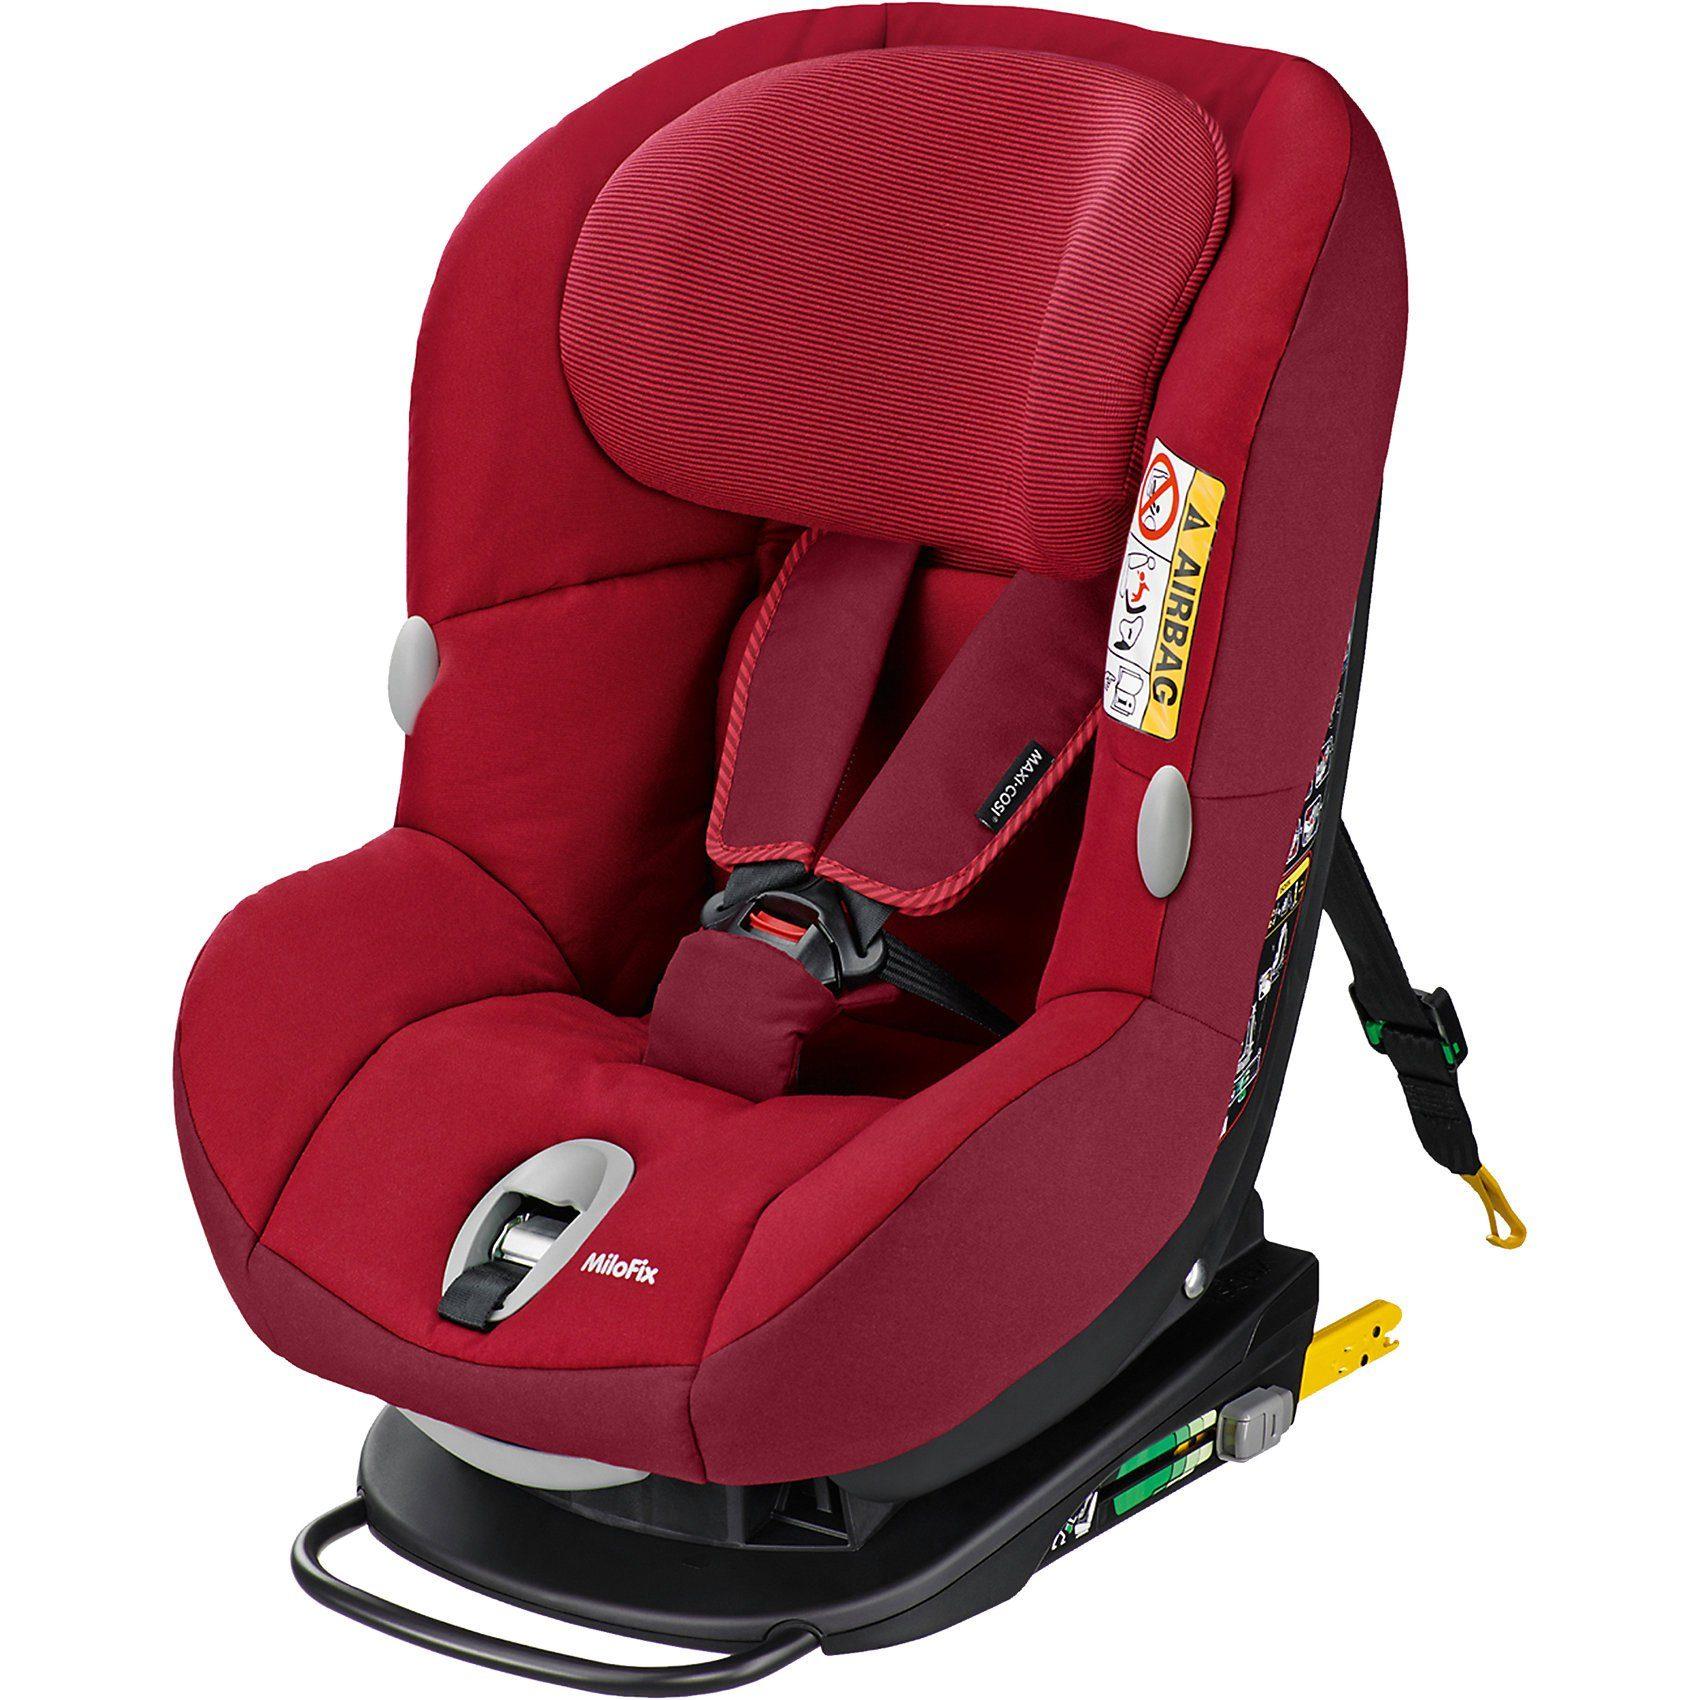 Maxi-Cosi Auto-Kindersitz MiloFix, robin red, 2017